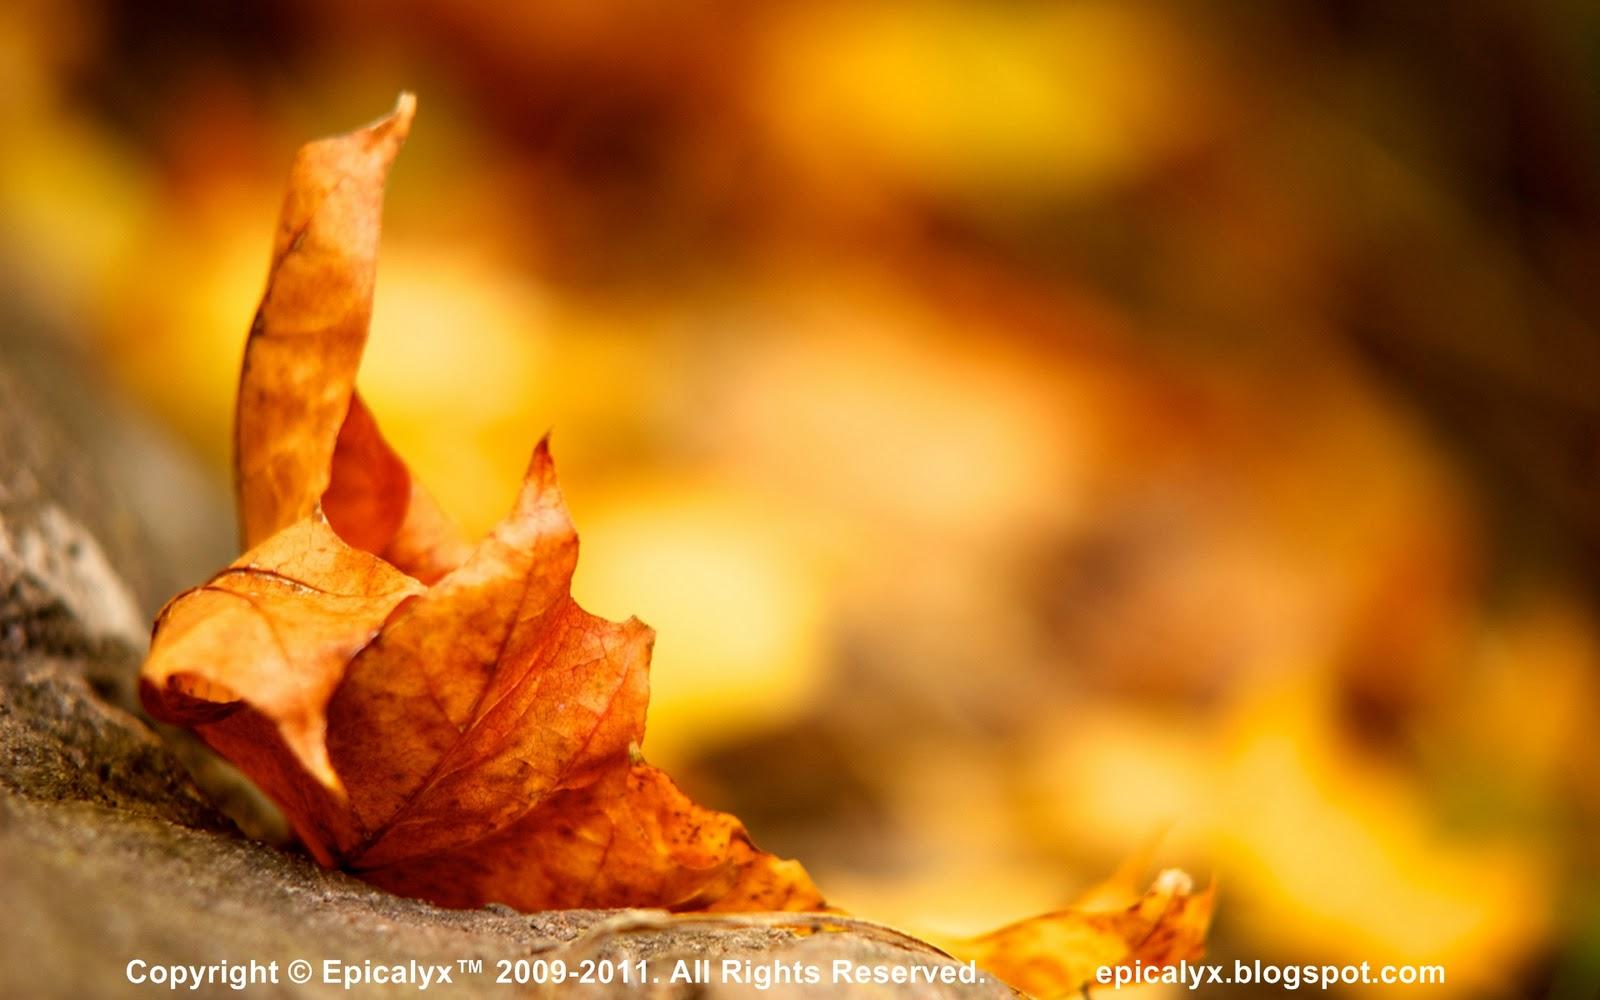 http://3.bp.blogspot.com/-8M5FvTP0nHw/TsDUH-JRJhI/AAAAAAAAAKQ/SJa5SZzy8s0/s1600/Dry+Maple+Leaf.jpg